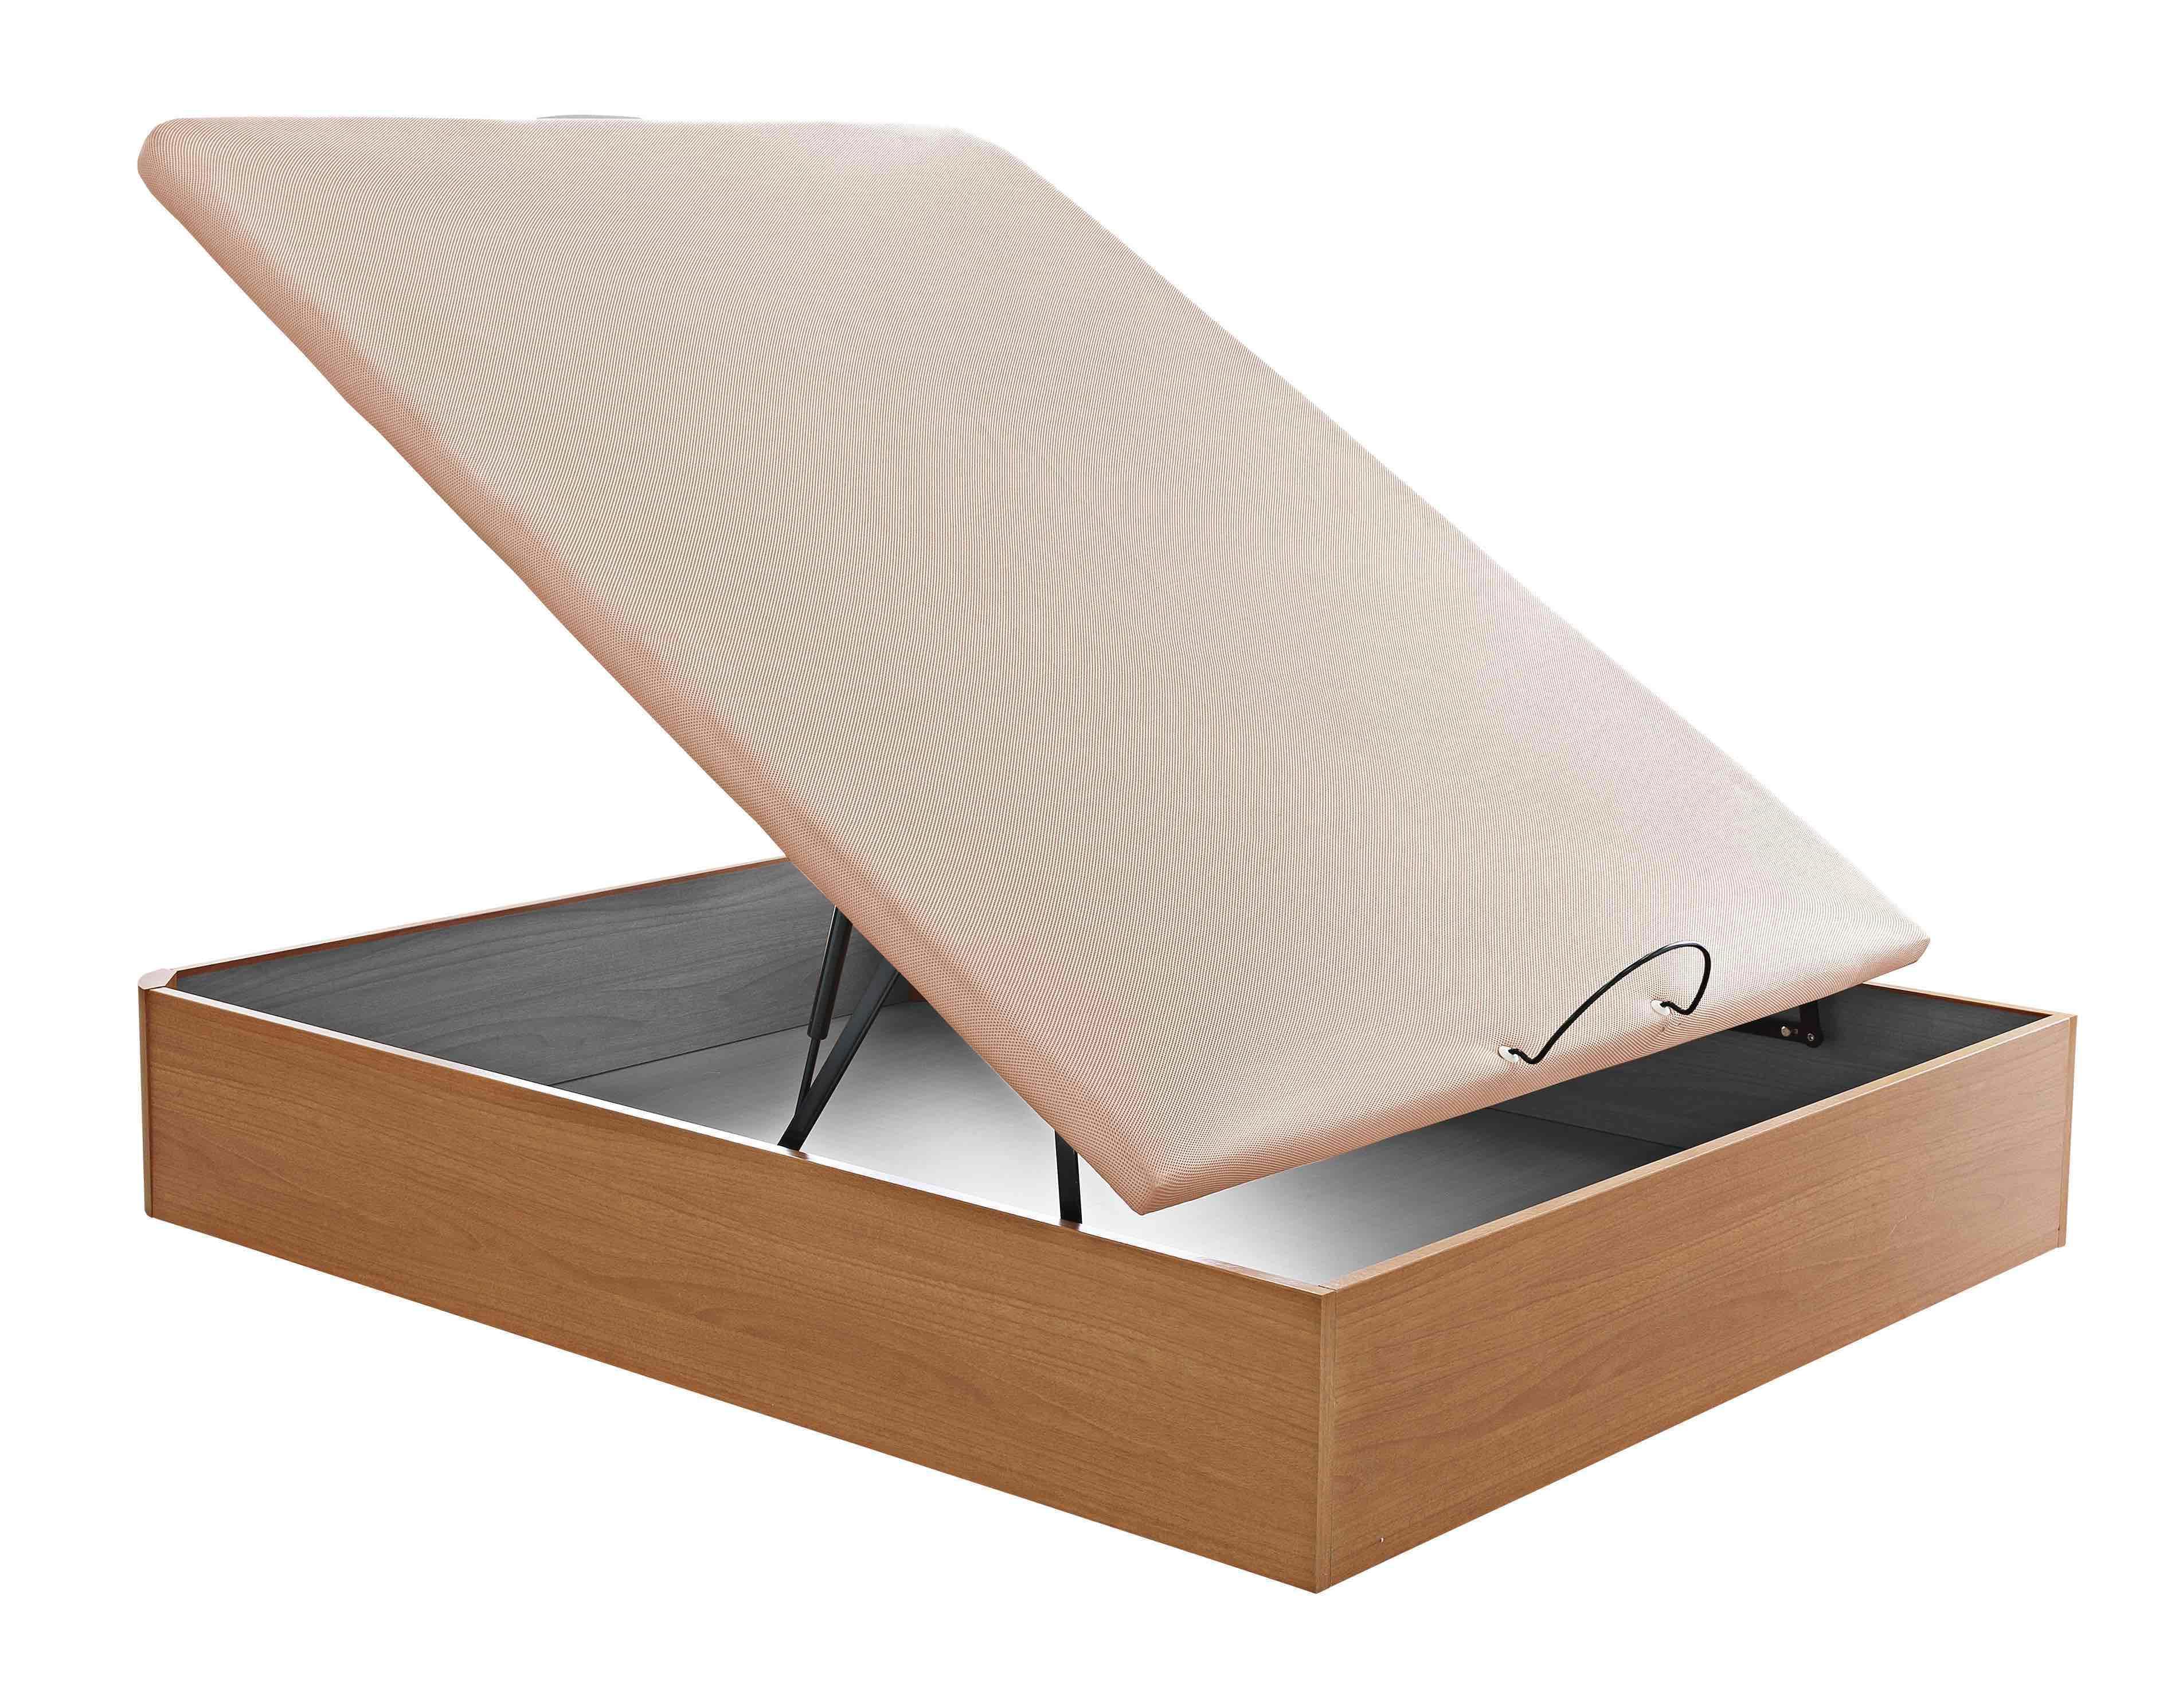 Canap de madera con somier menalib - Canapes de diseno ...